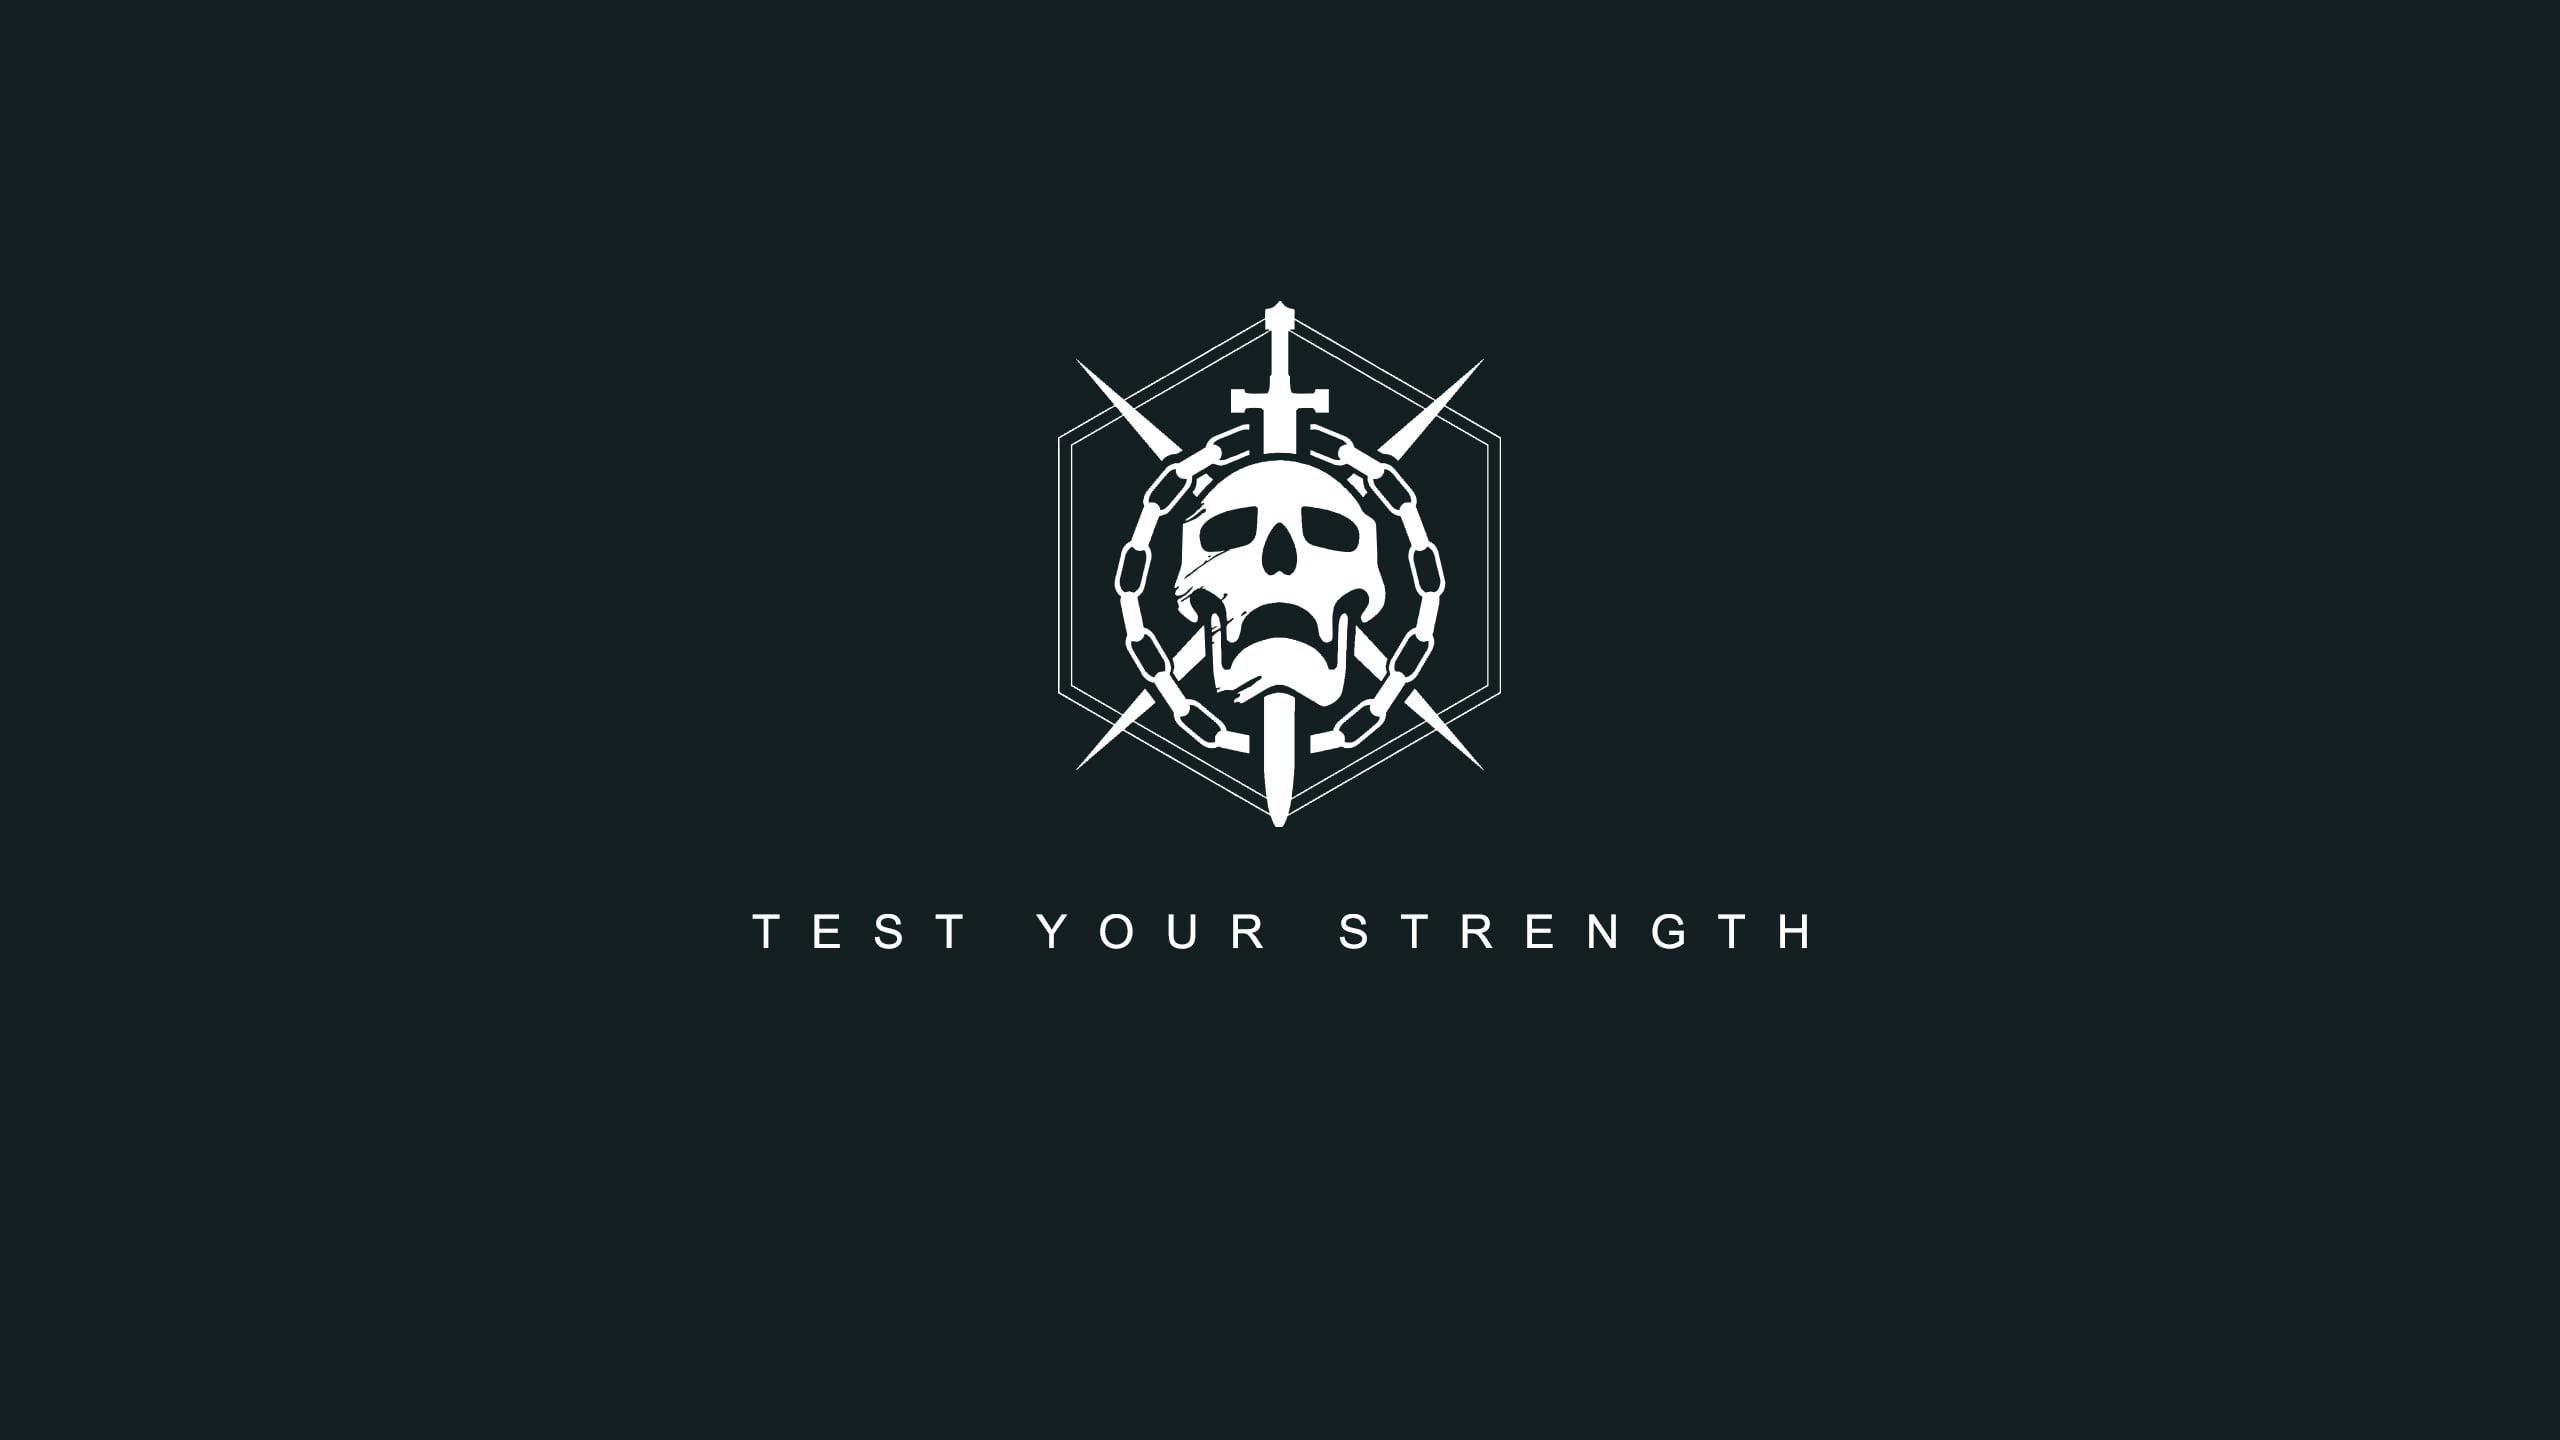 Test Your Strength skull wallpaper HD wallpaper Wallpaper Flare 2560x1440